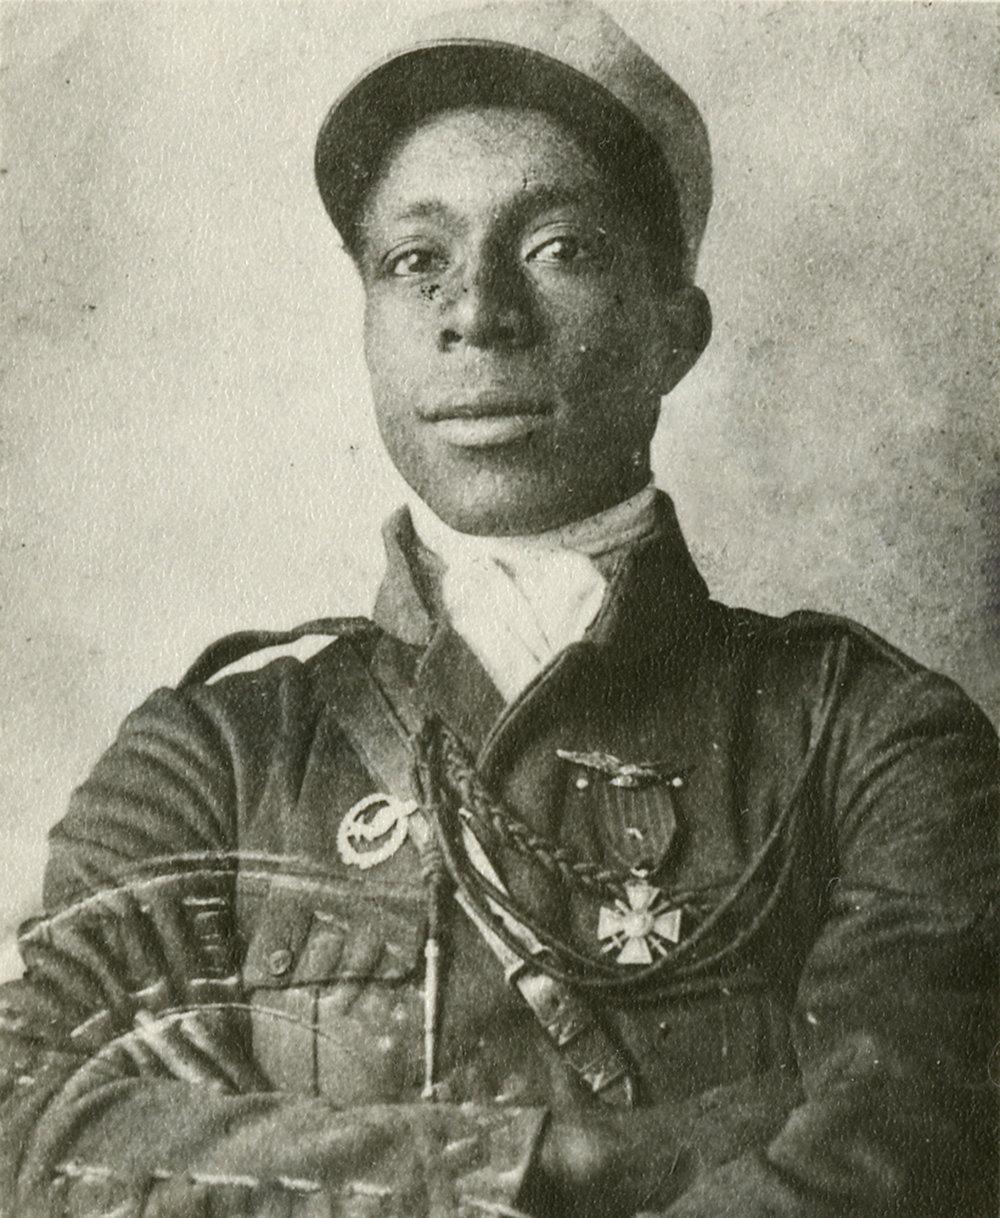 Eugene_Bullard_in_Legionnaire_Uniform.jpg